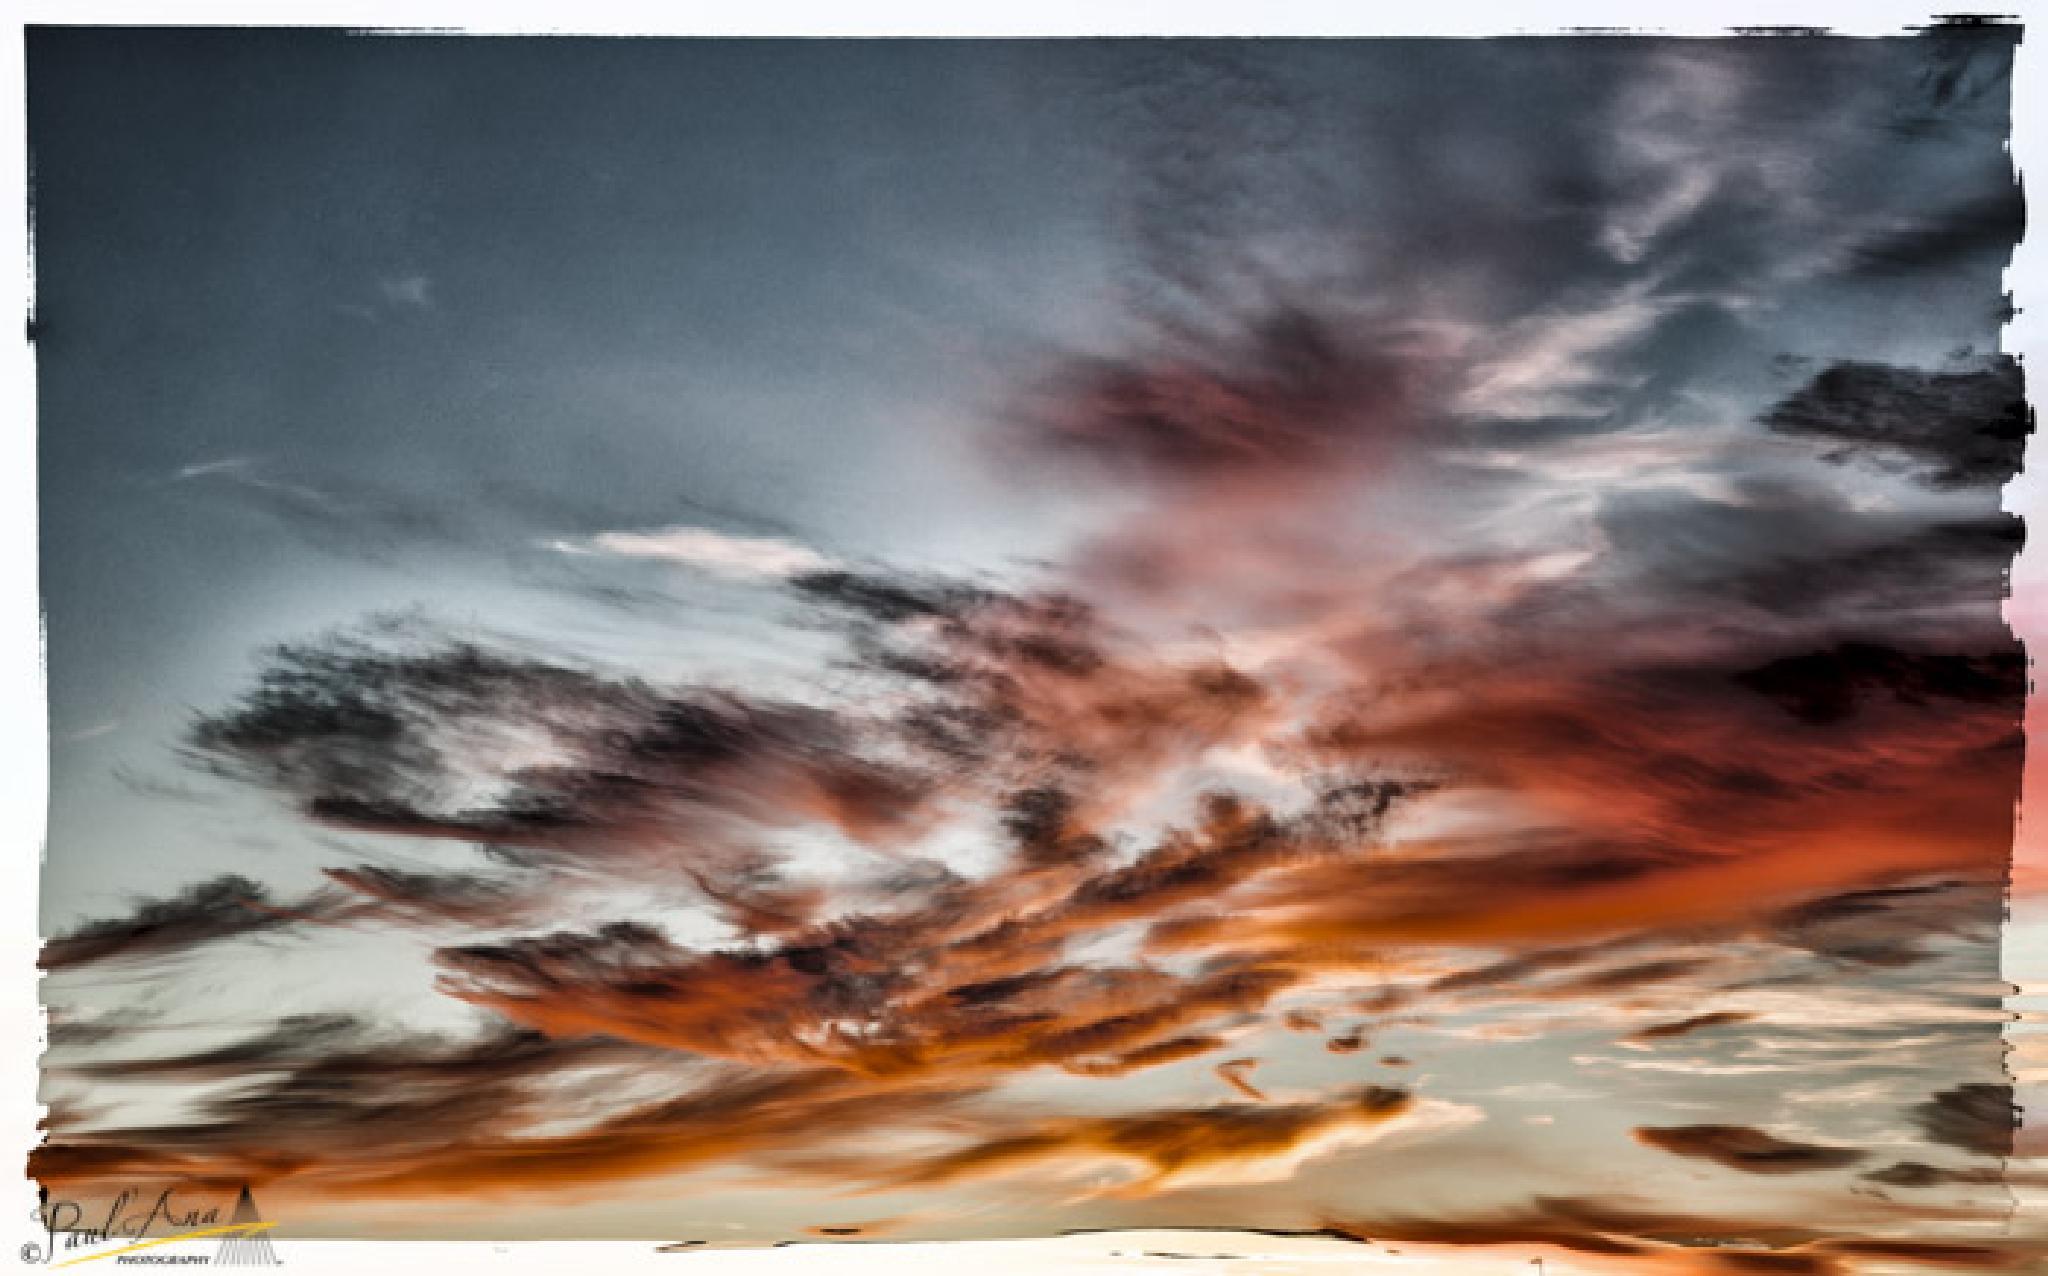 Art in the sky by Paul'Ana